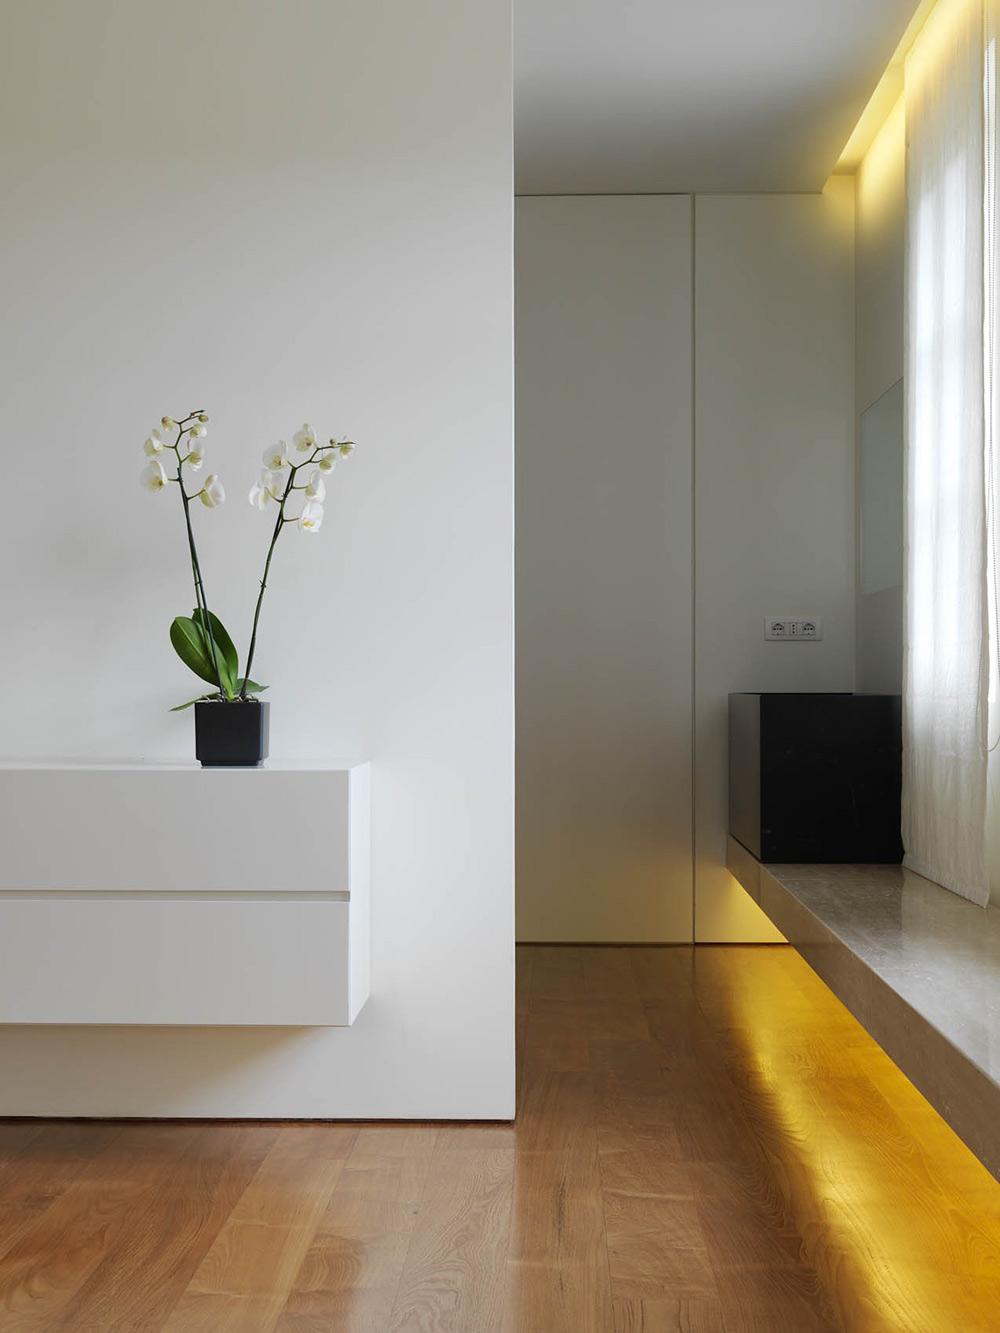 Bedroom, Lighting, Minimalist Interior in Tuscany, Italy by Victor Vasilev